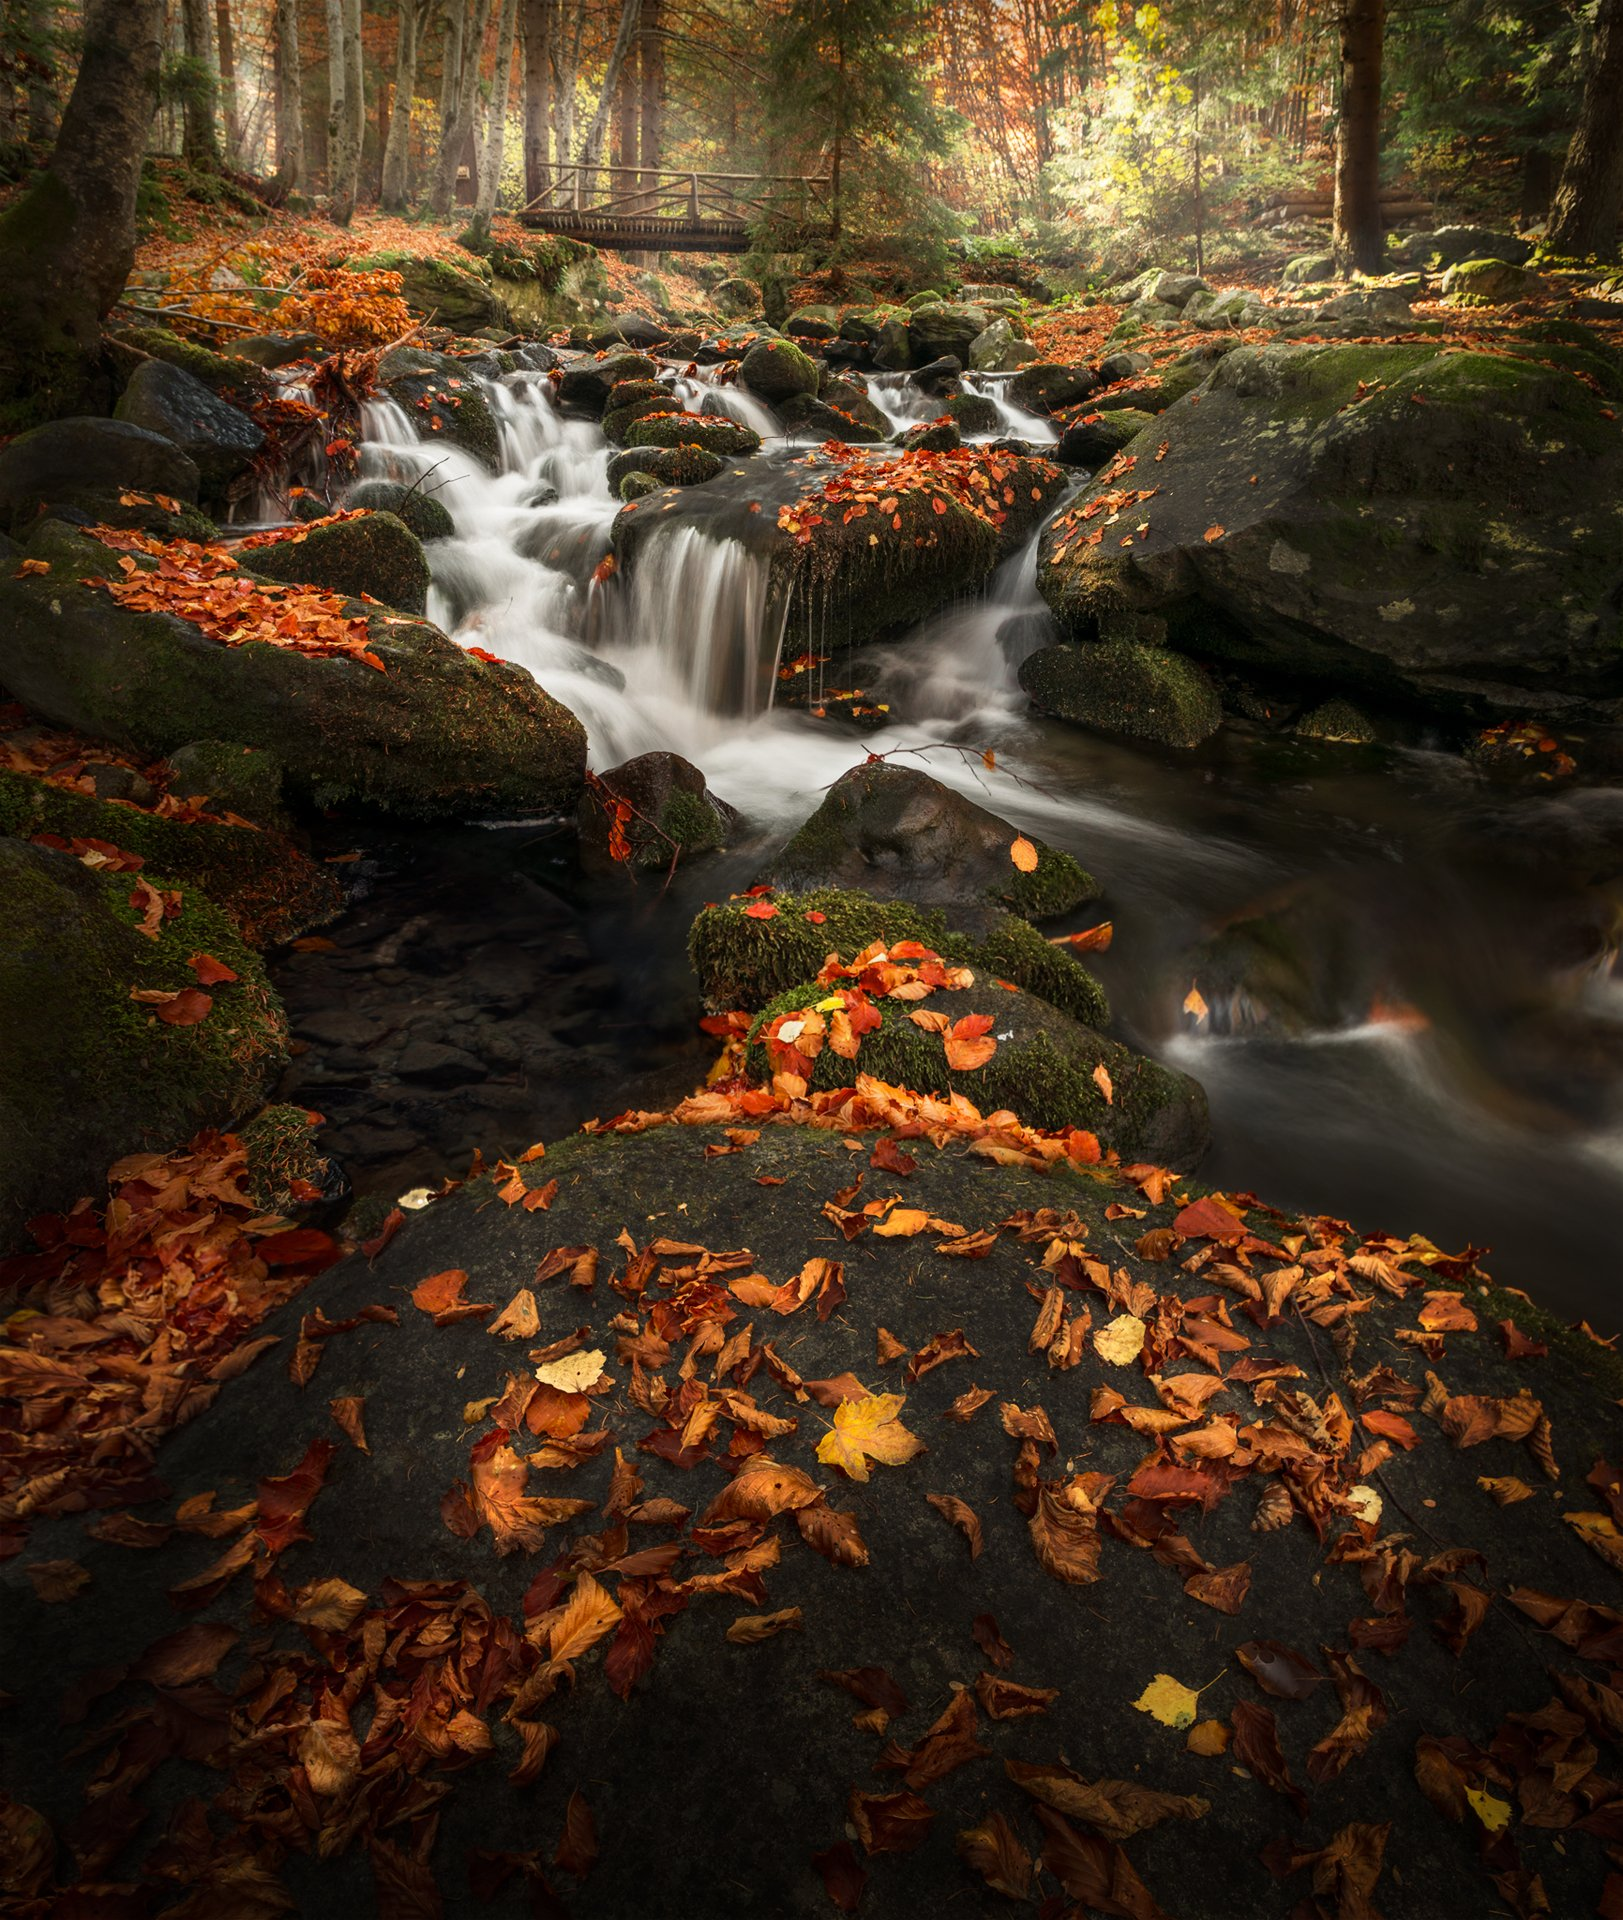 landscape nature scenery forest wood autumn river longexposure mountain rocks leaves bridge vitosha bulgaria лес oсень, Александров Александър